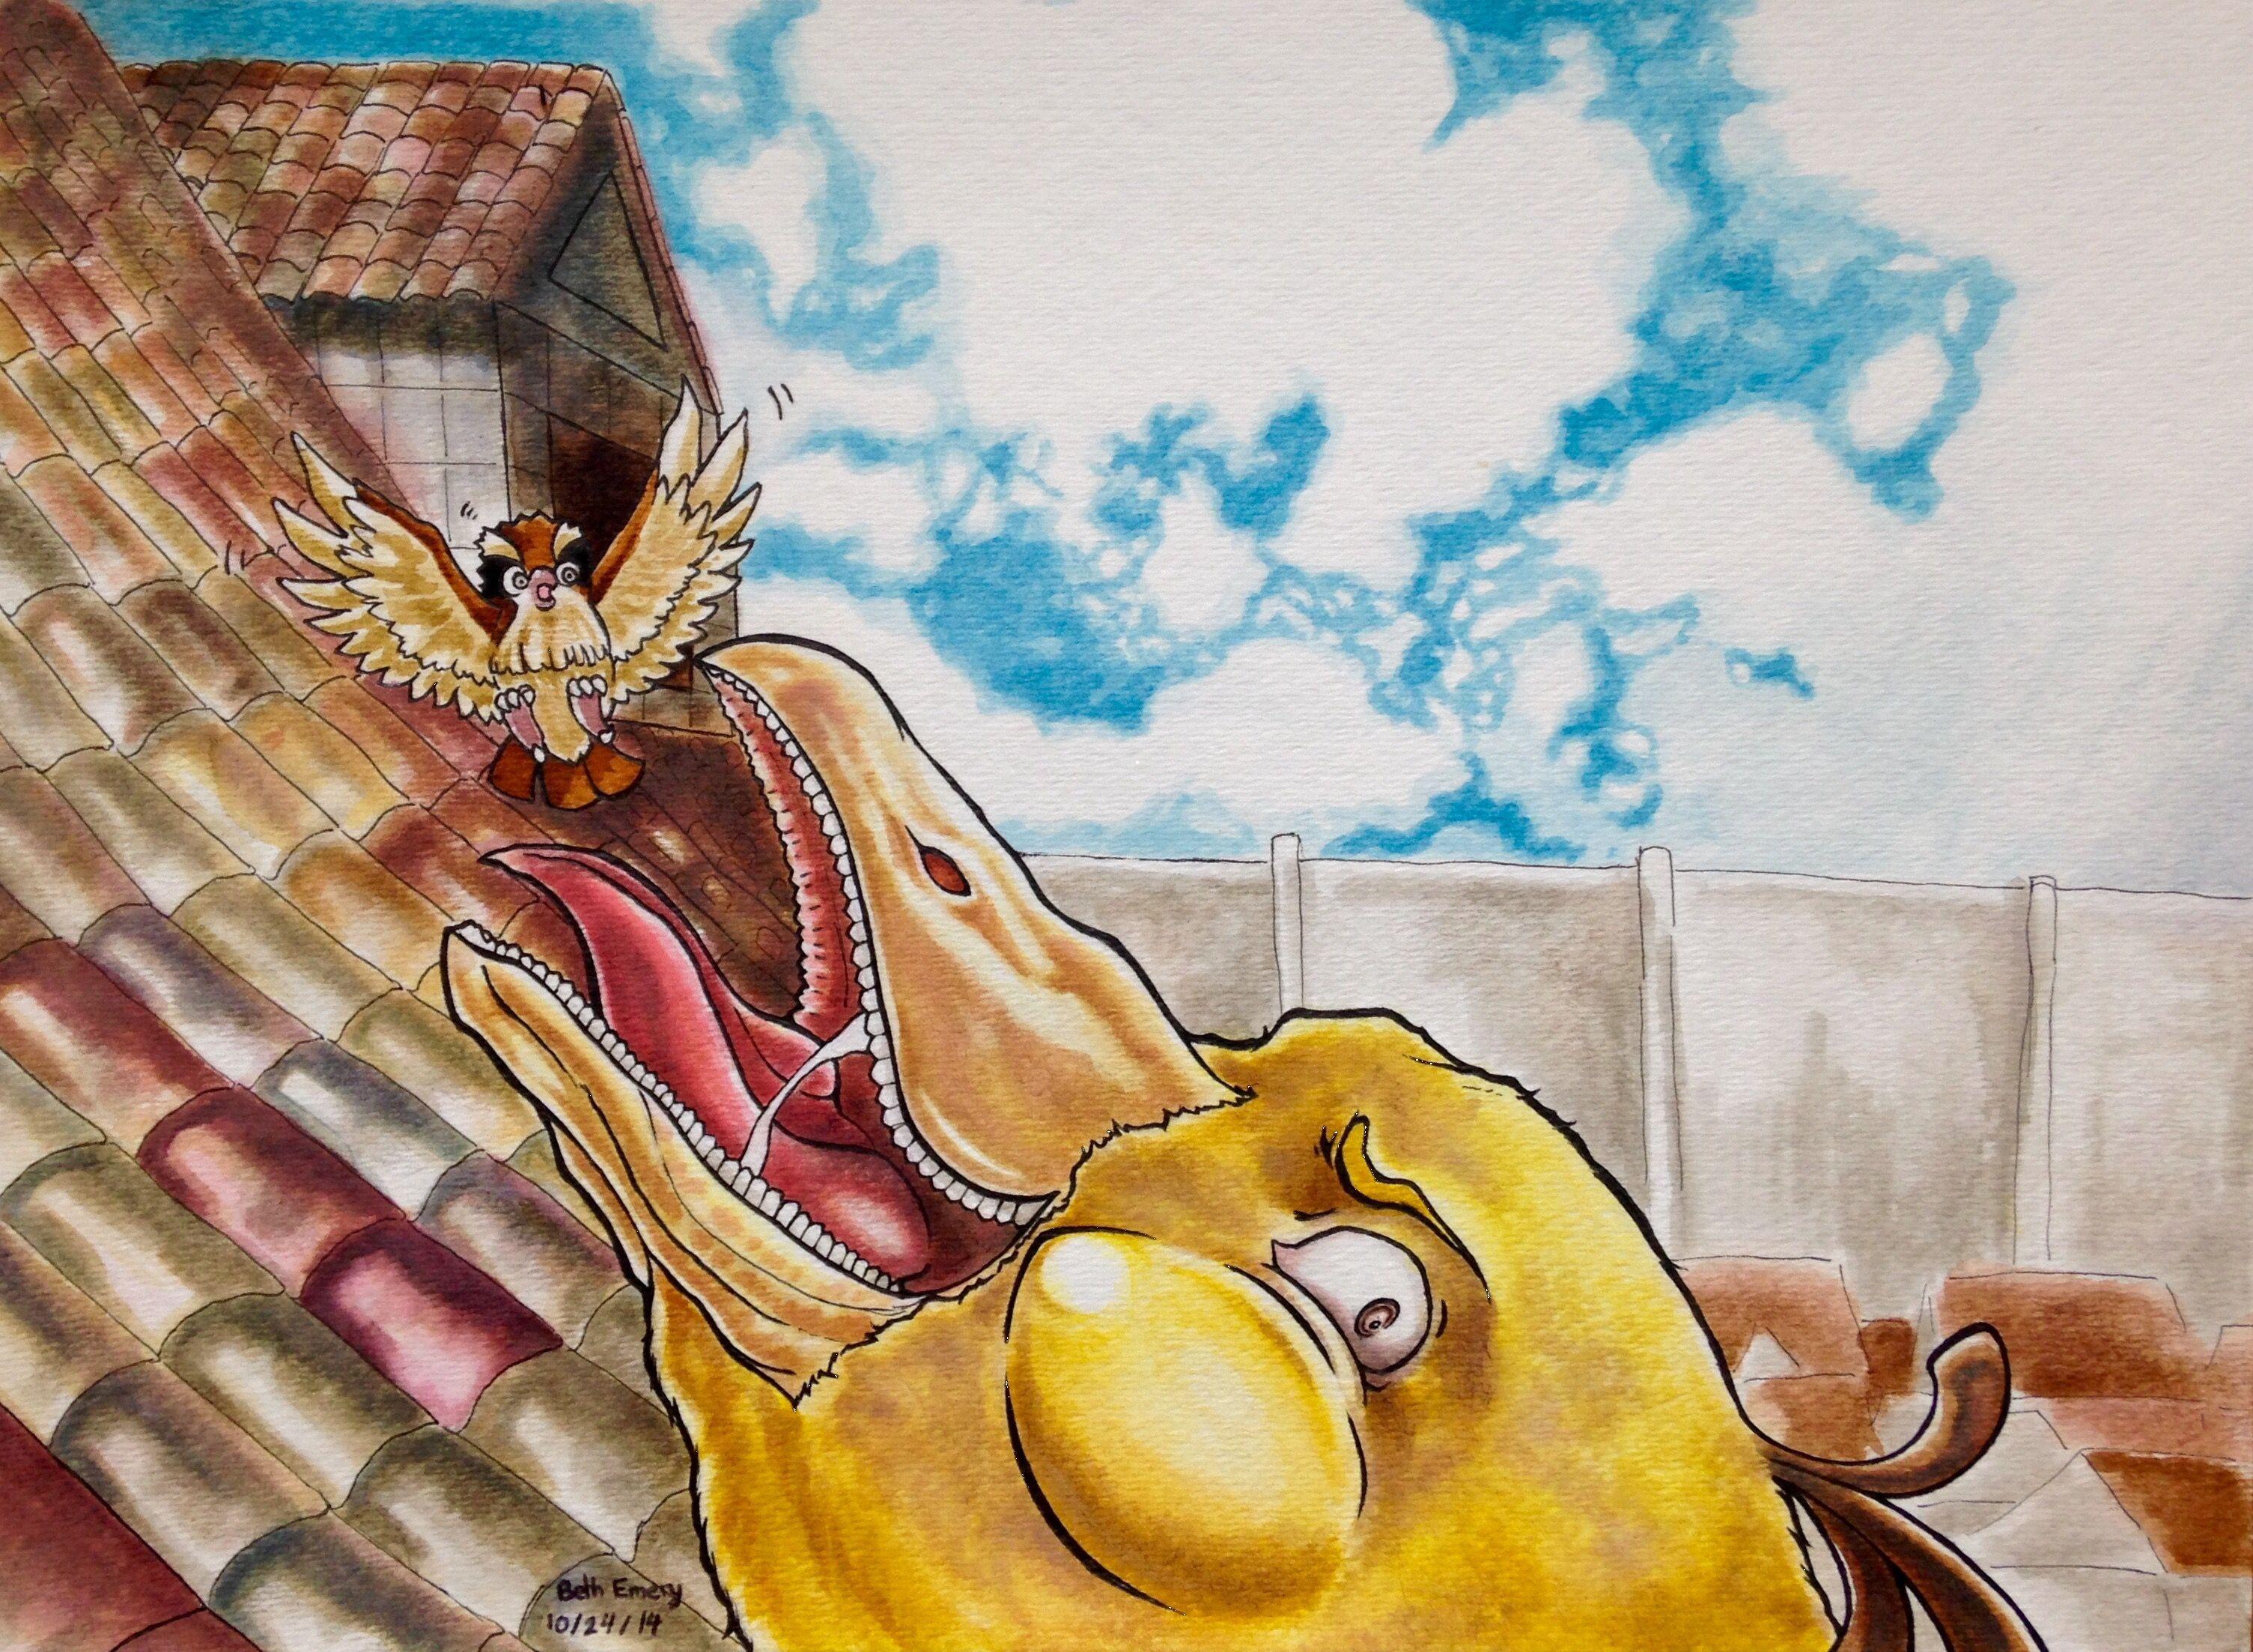 Pin by Trevor Elia on Pokémon | Anime crossover, Artist, Attack on titan